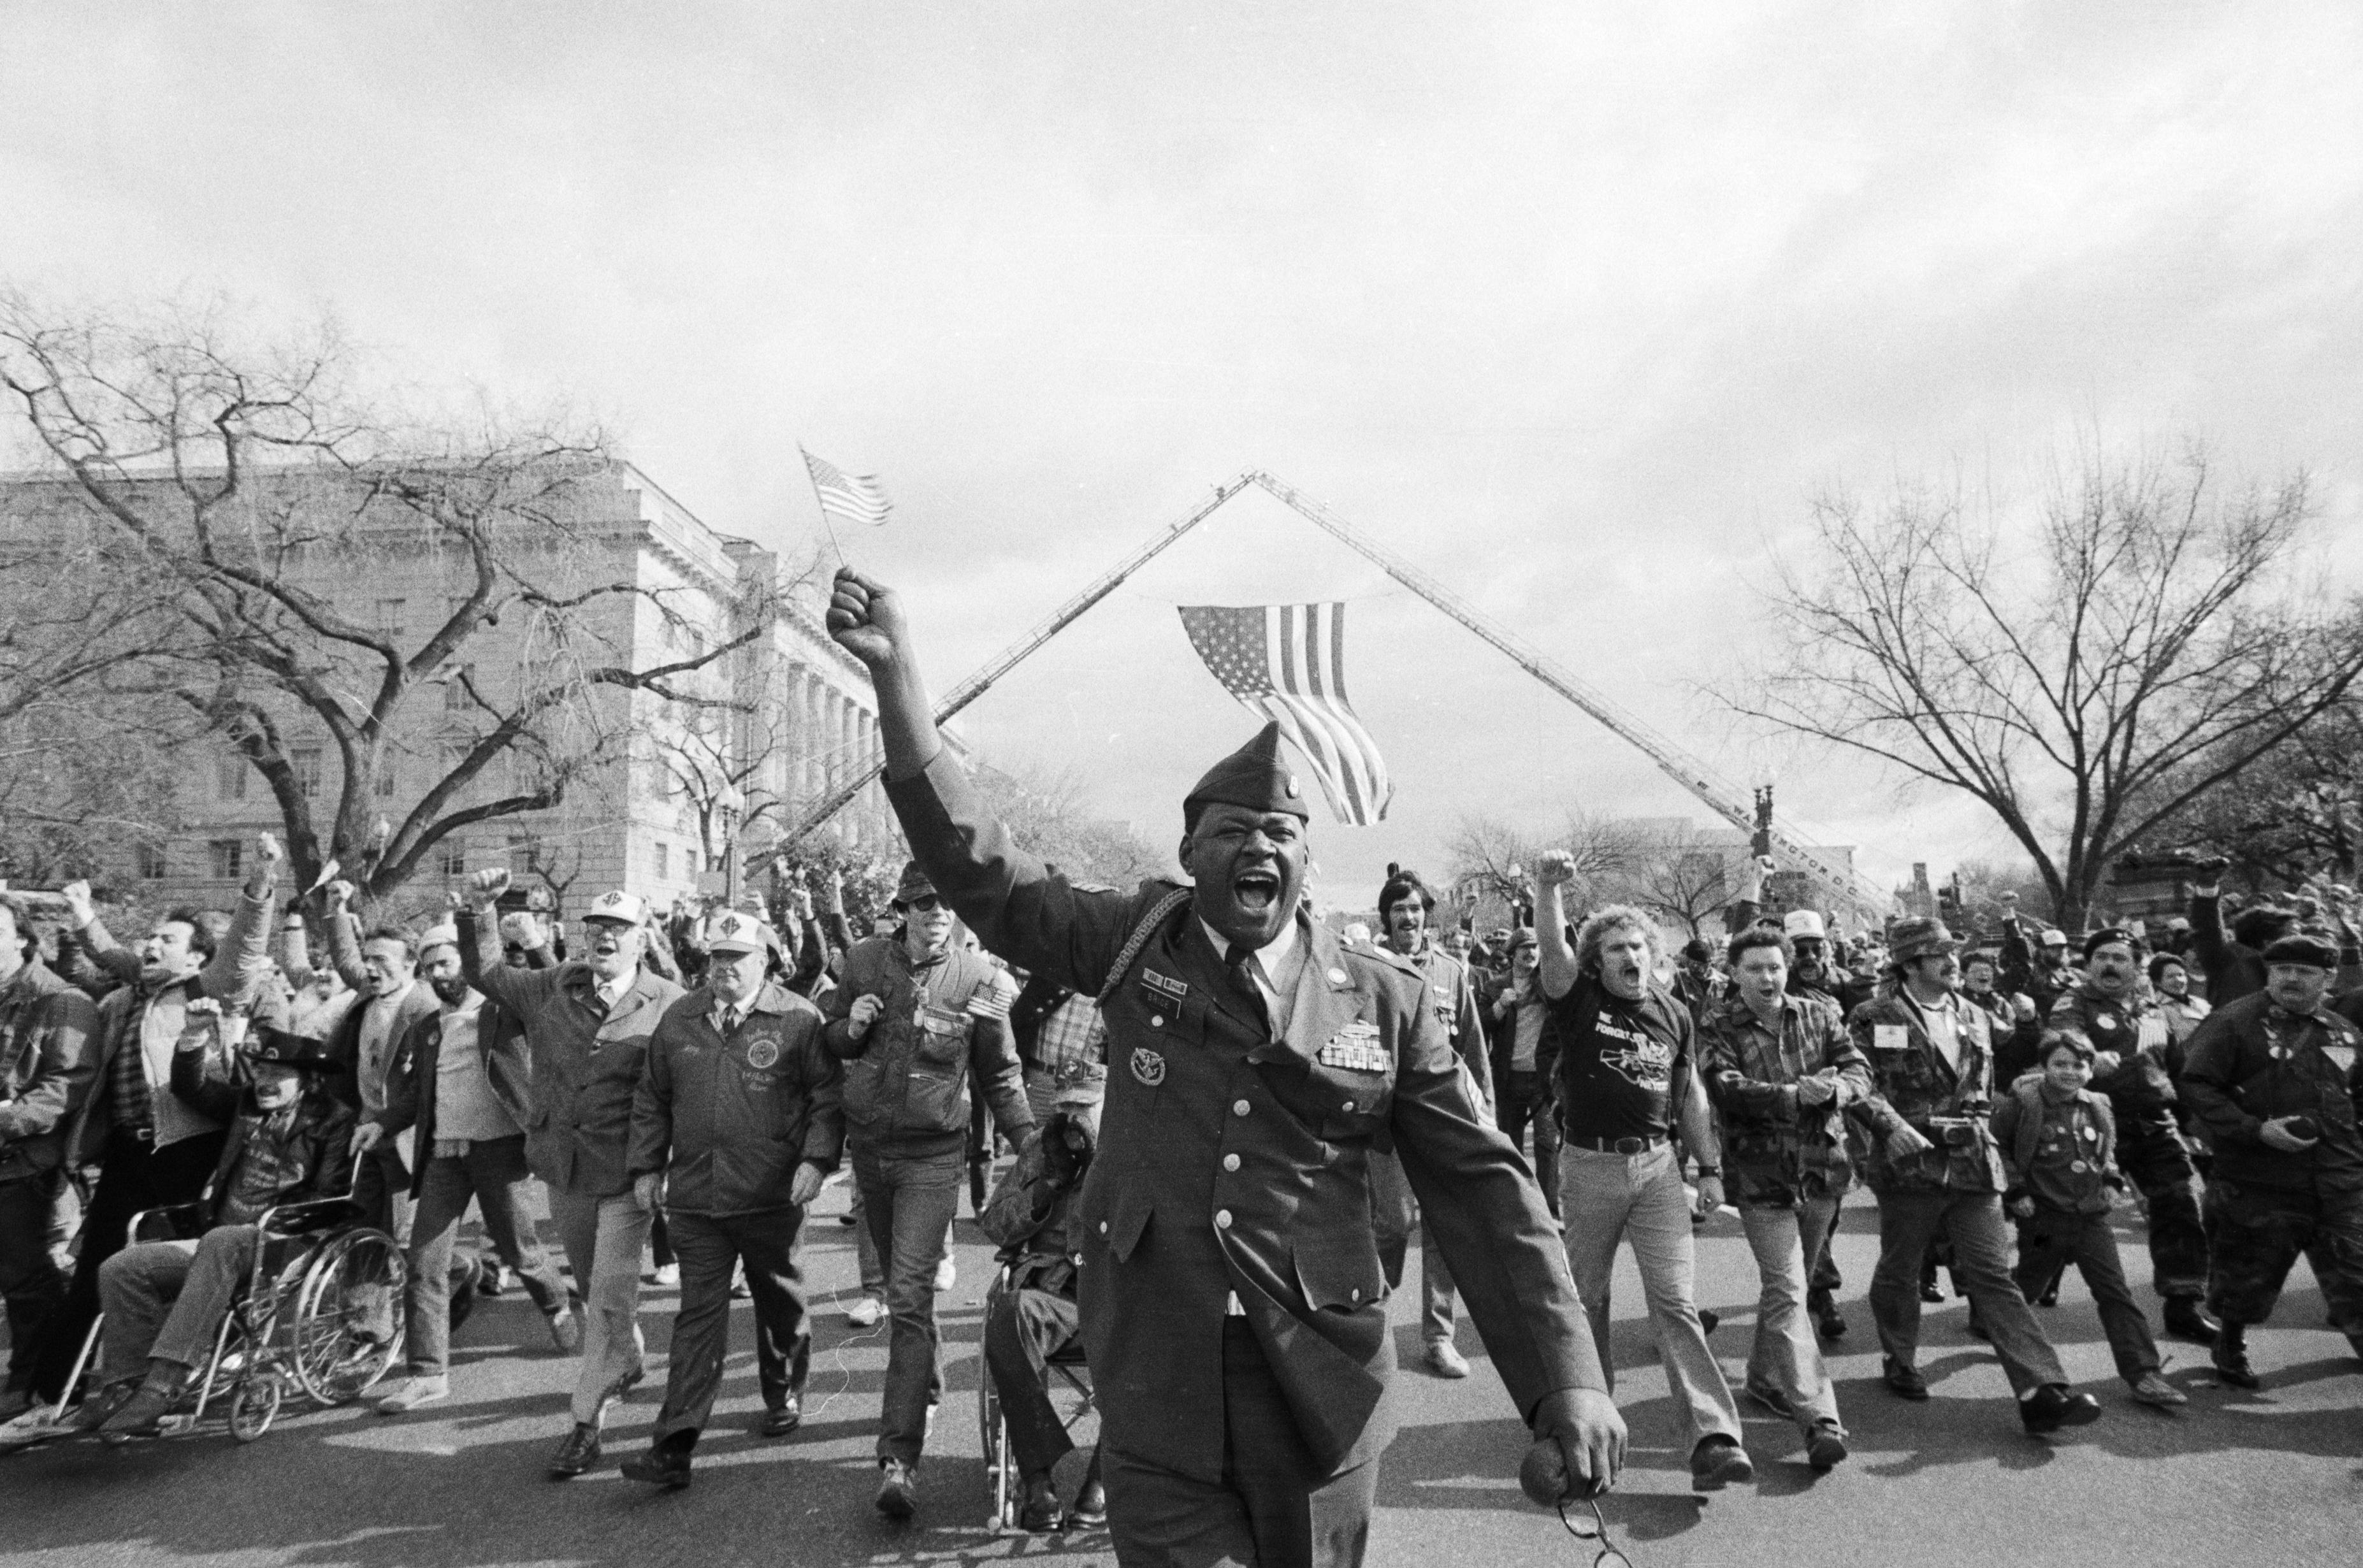 Vietnam veteran Eugene Brice at the 1982 Vietnam Veteran's parade in Washington D.C.